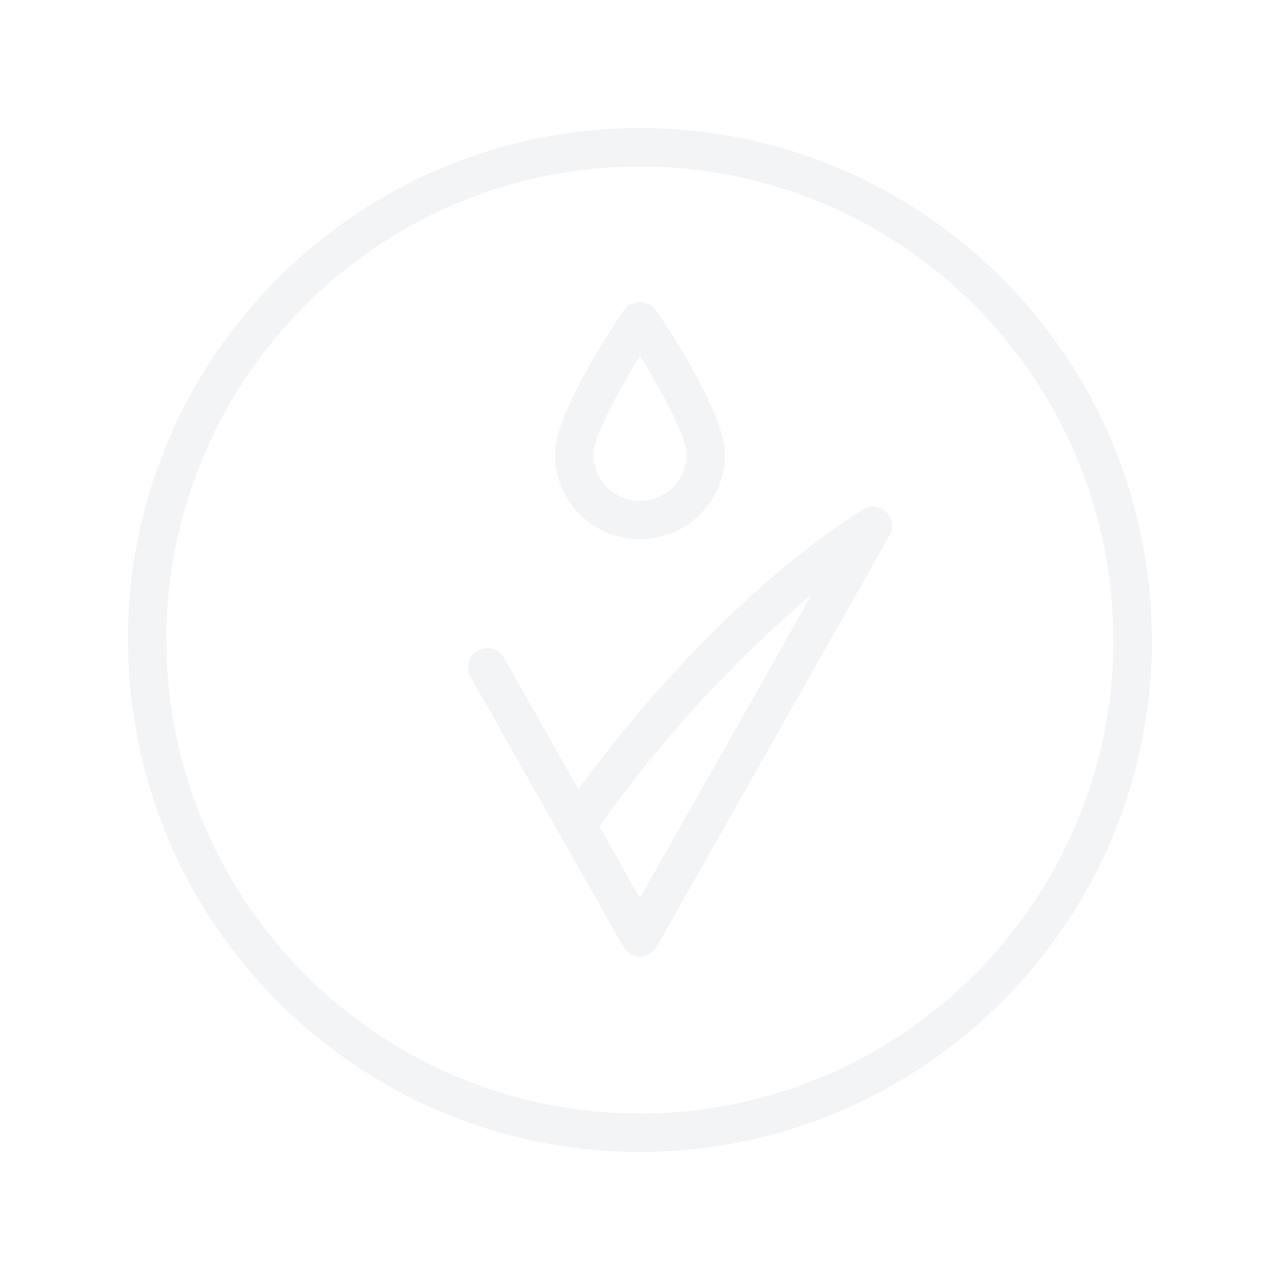 ANESI Harmonie Gommage Caresse Cream 50ml